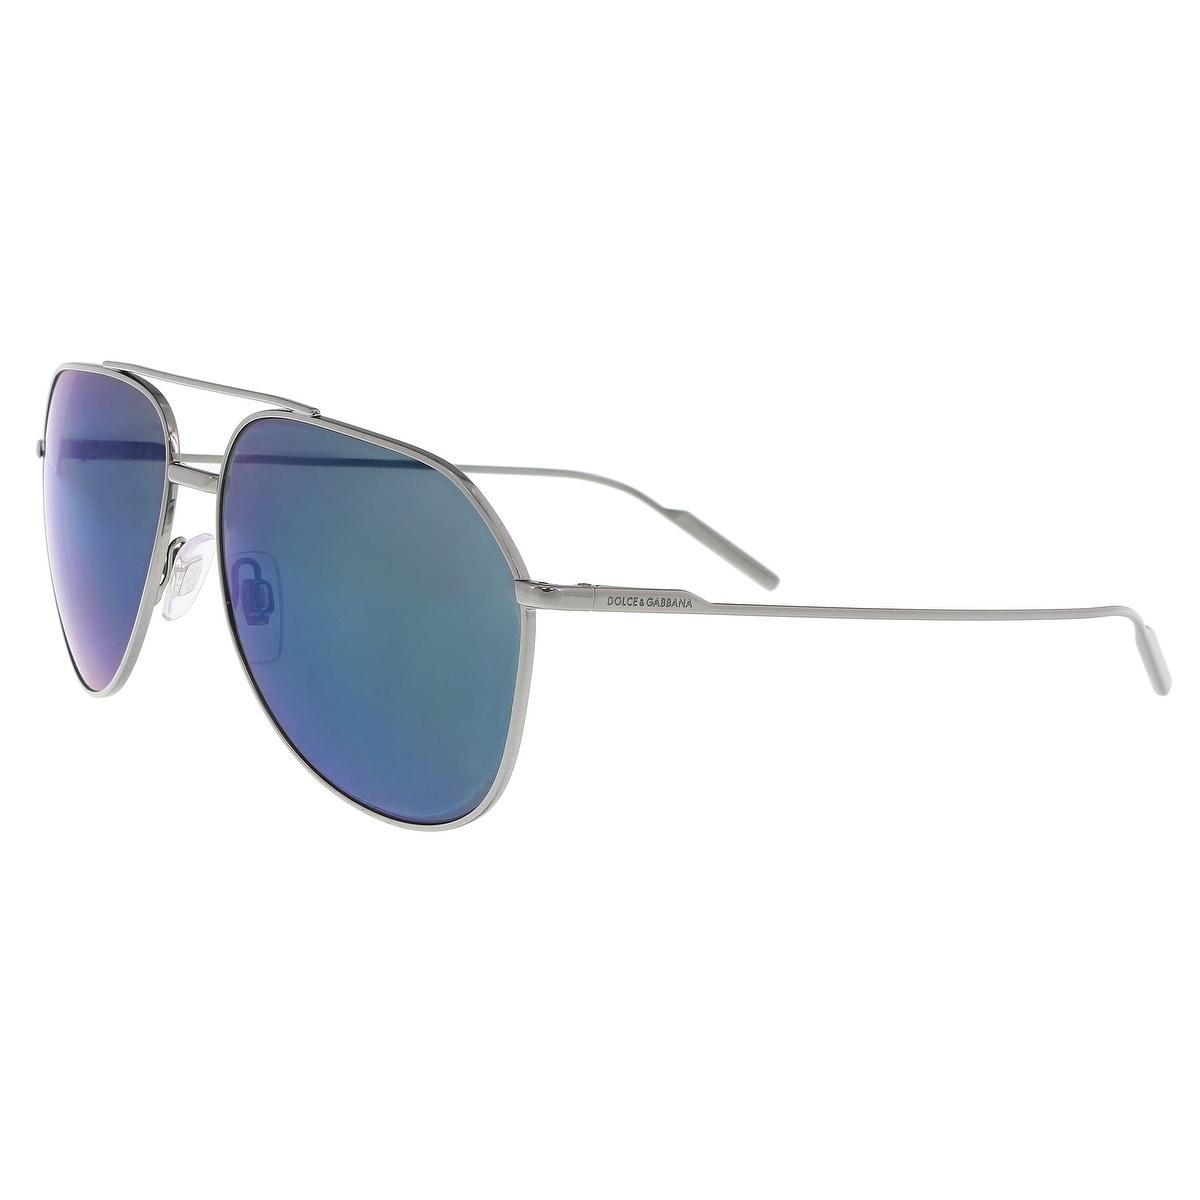 924bb9d2f354 Shop Dolce   Gabbana DG2166 04 96 Gunmetal Aviator Sunglasses - 61 ...